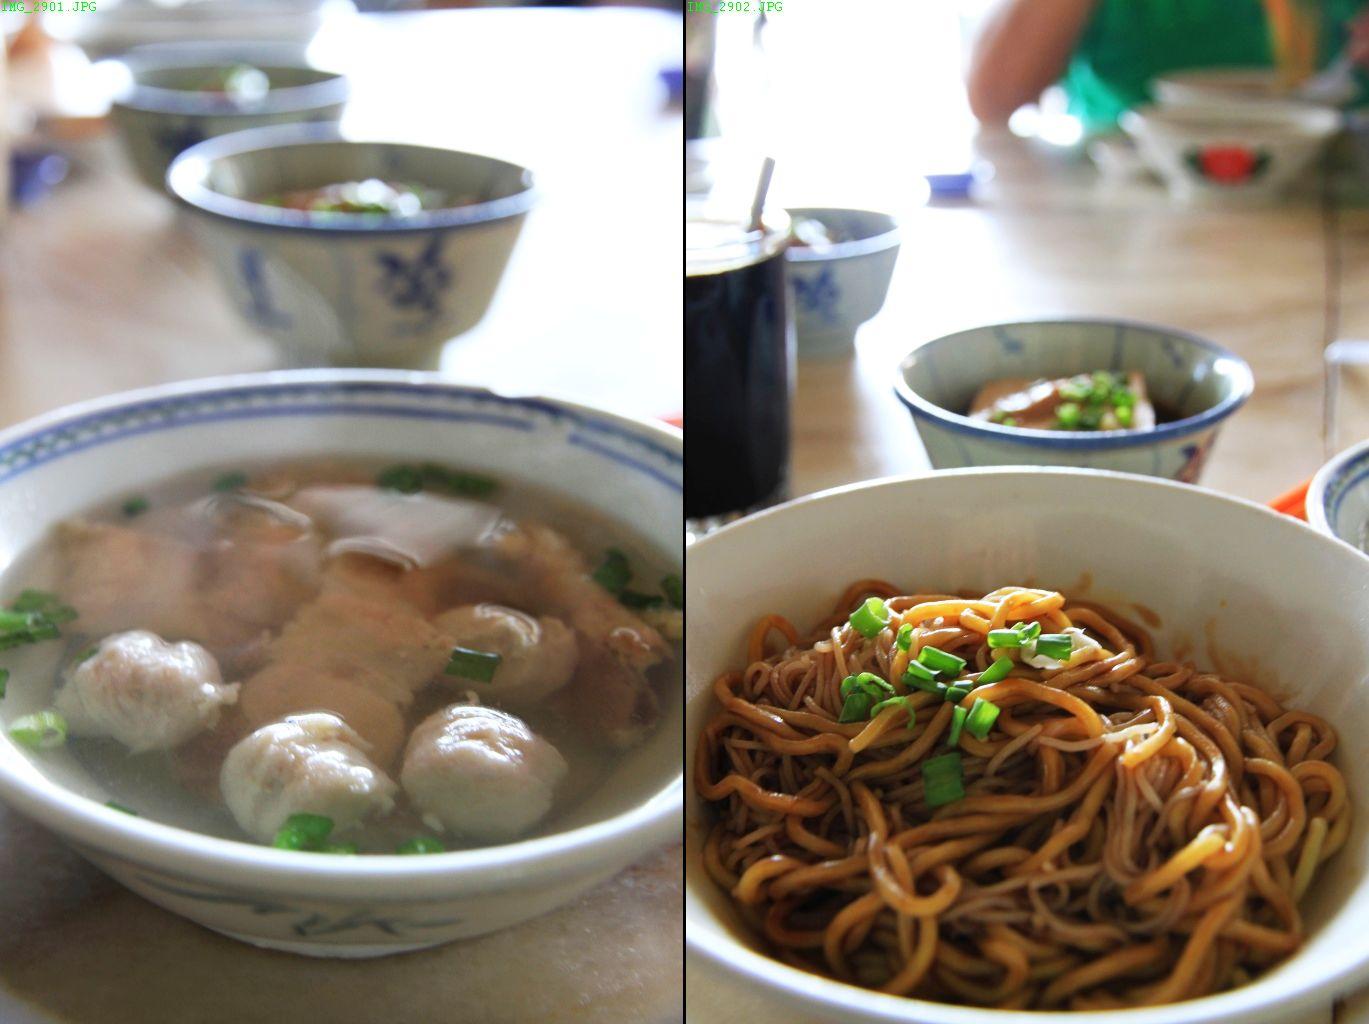 Kadazan Pork Mee, Noodles